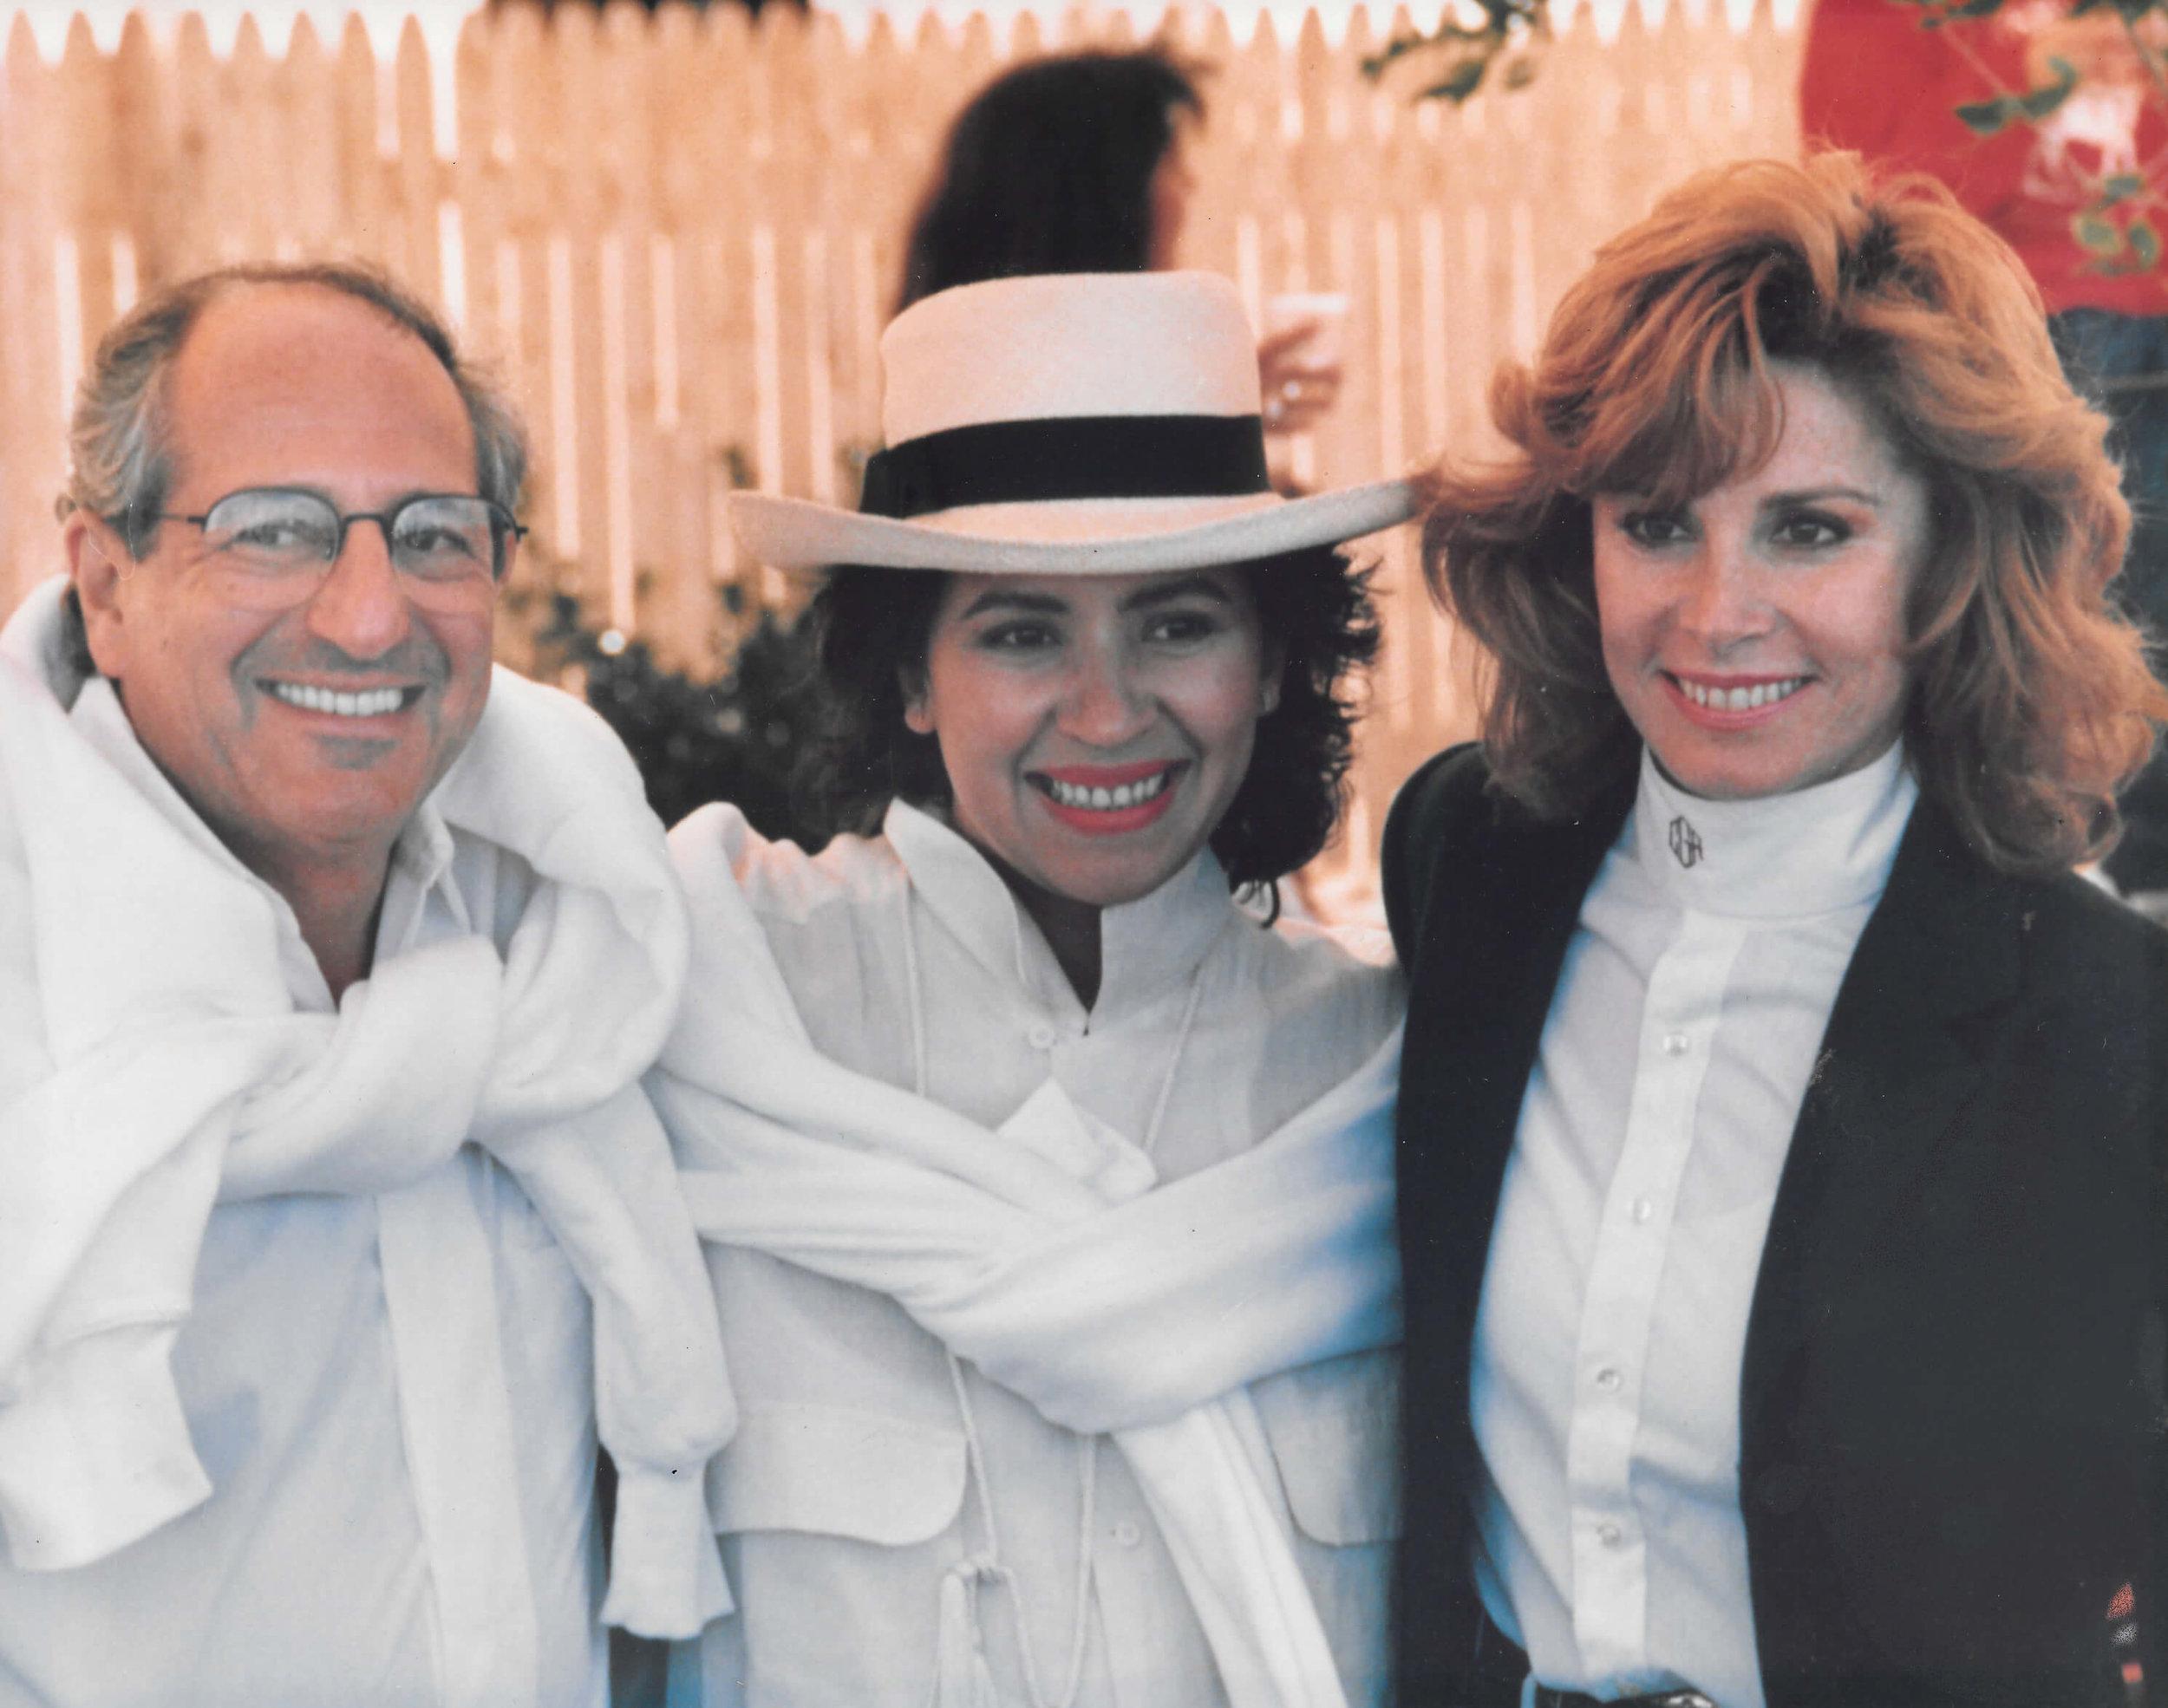 Jose Maggie Hess and Stefanie Powers 1991.jpg